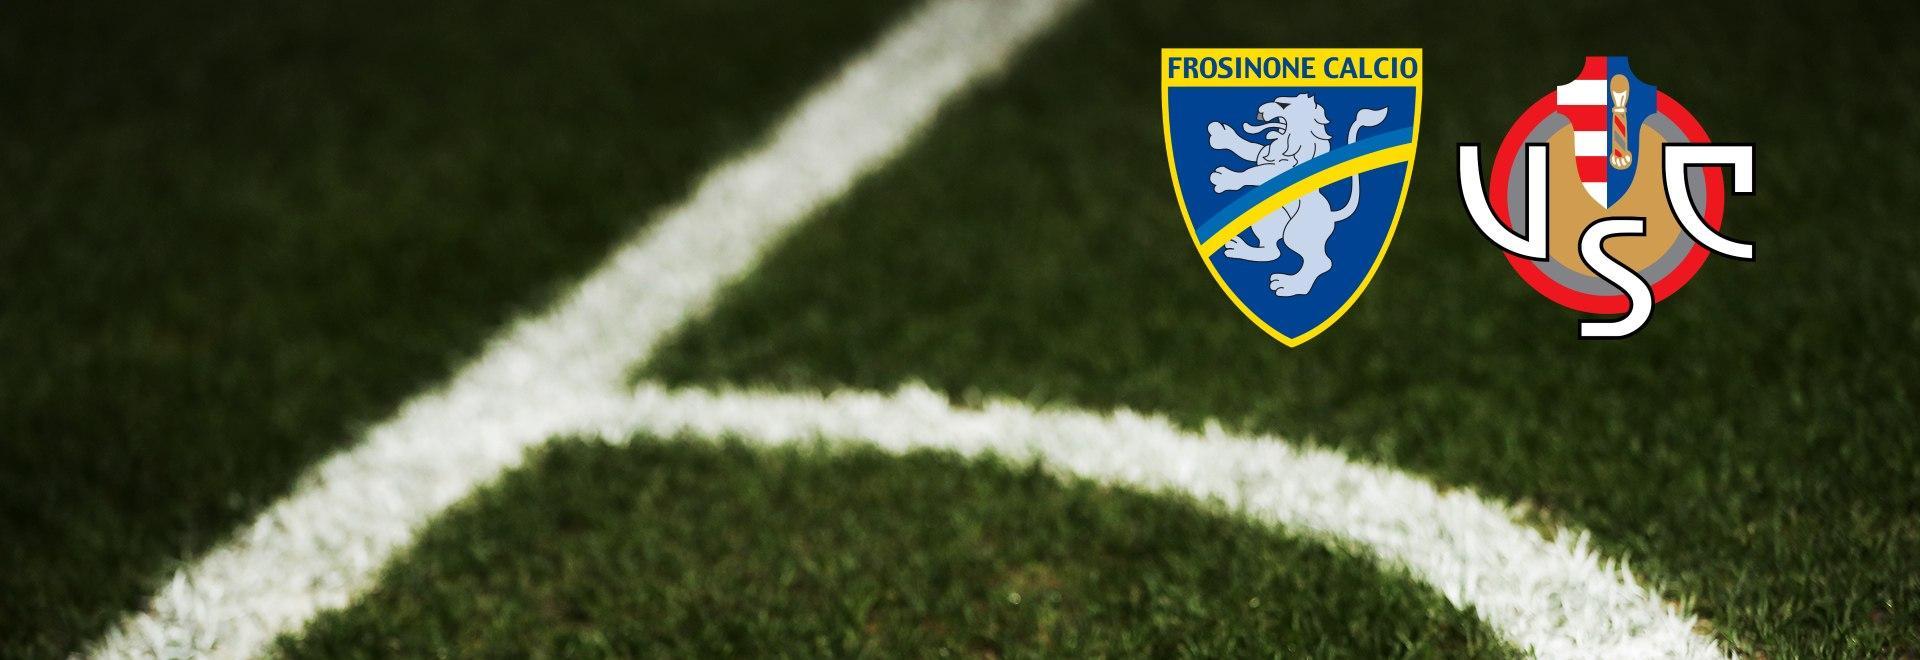 Frosinone - Cremonese. 28a g.